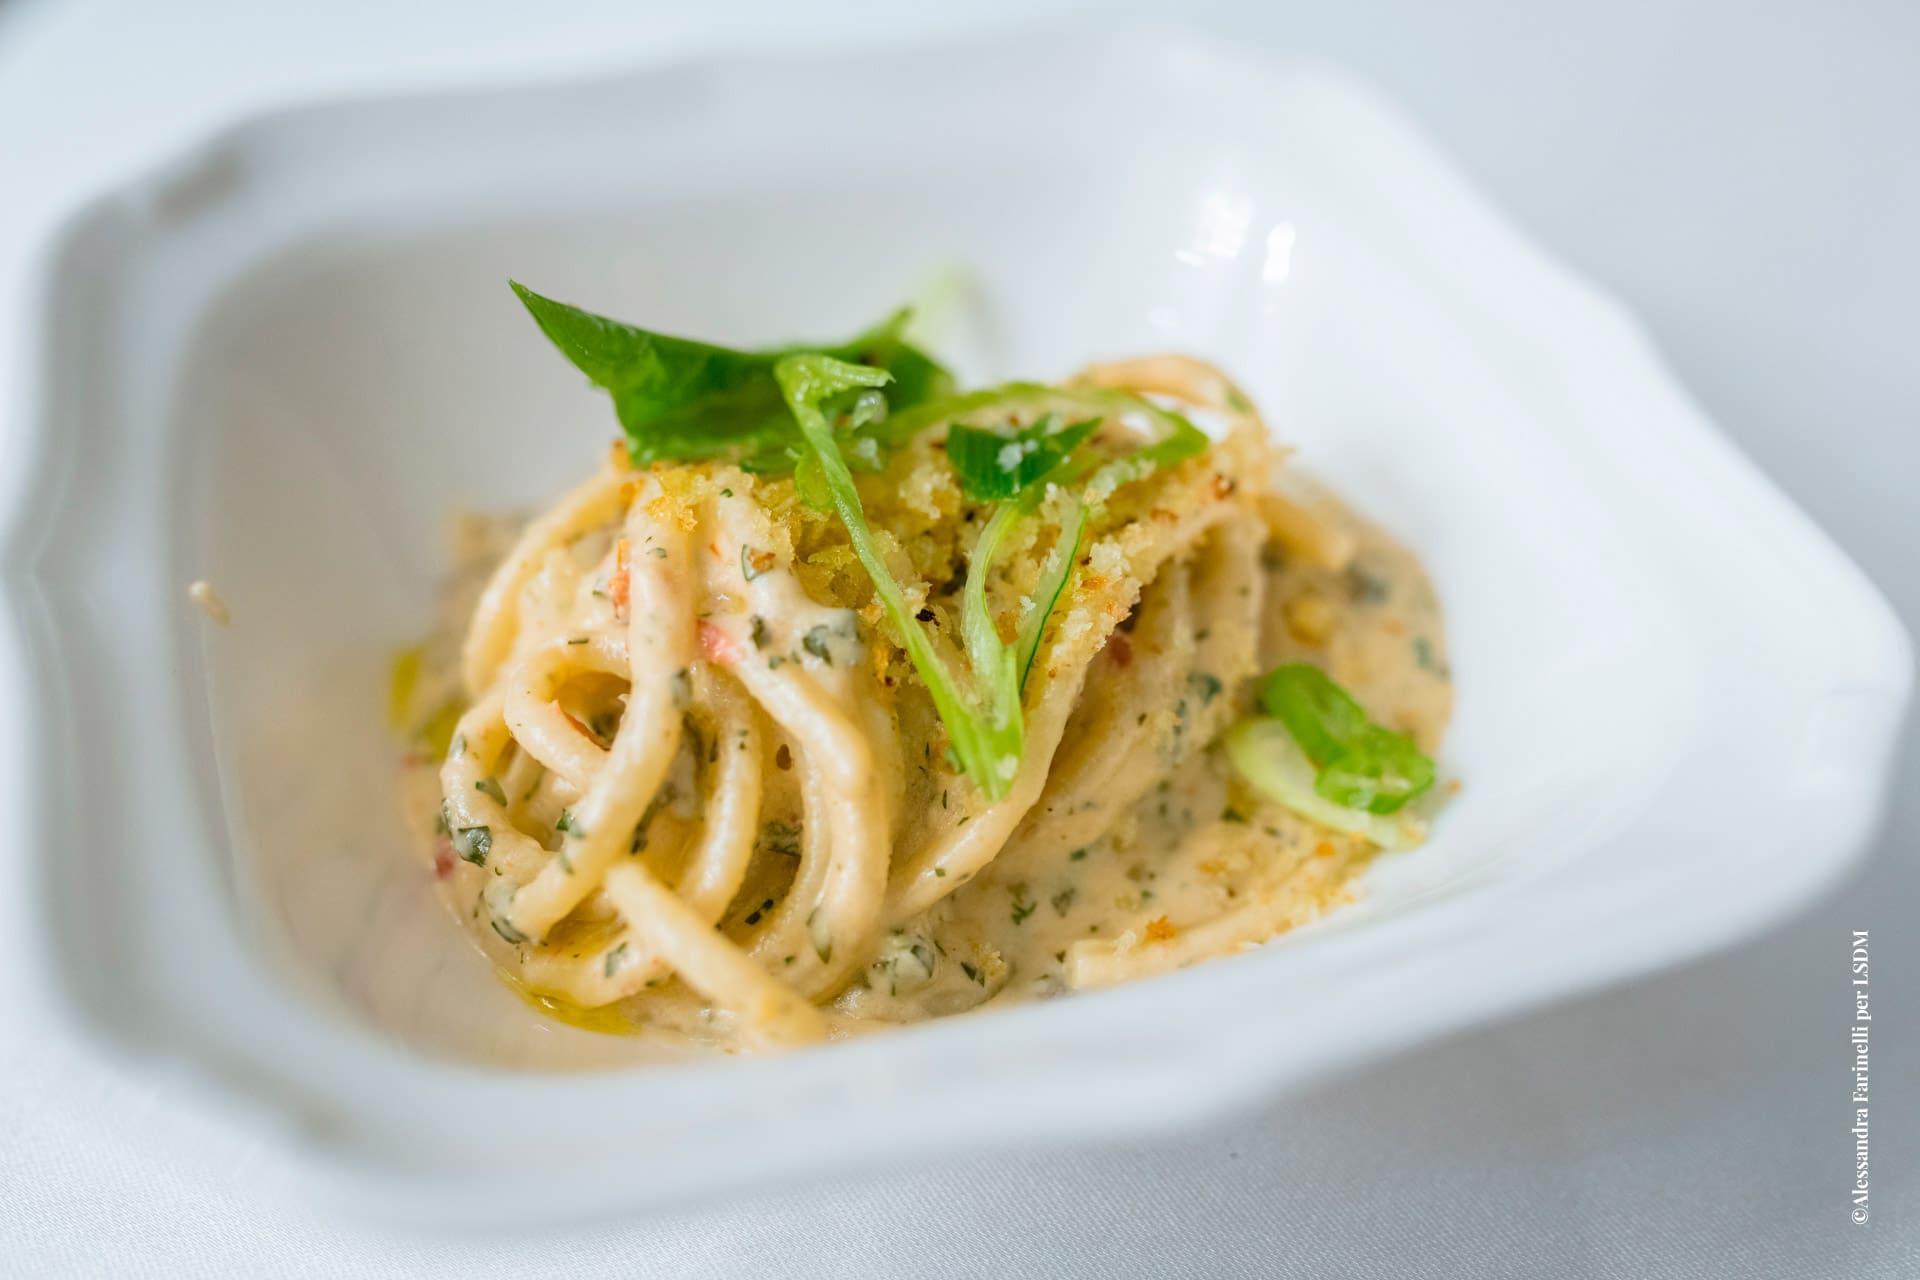 Chef Riccardo Orfino: Bucatini, cashew-kombu cream, Mediterranean pesto, Sorrento lemons, bread crumbs